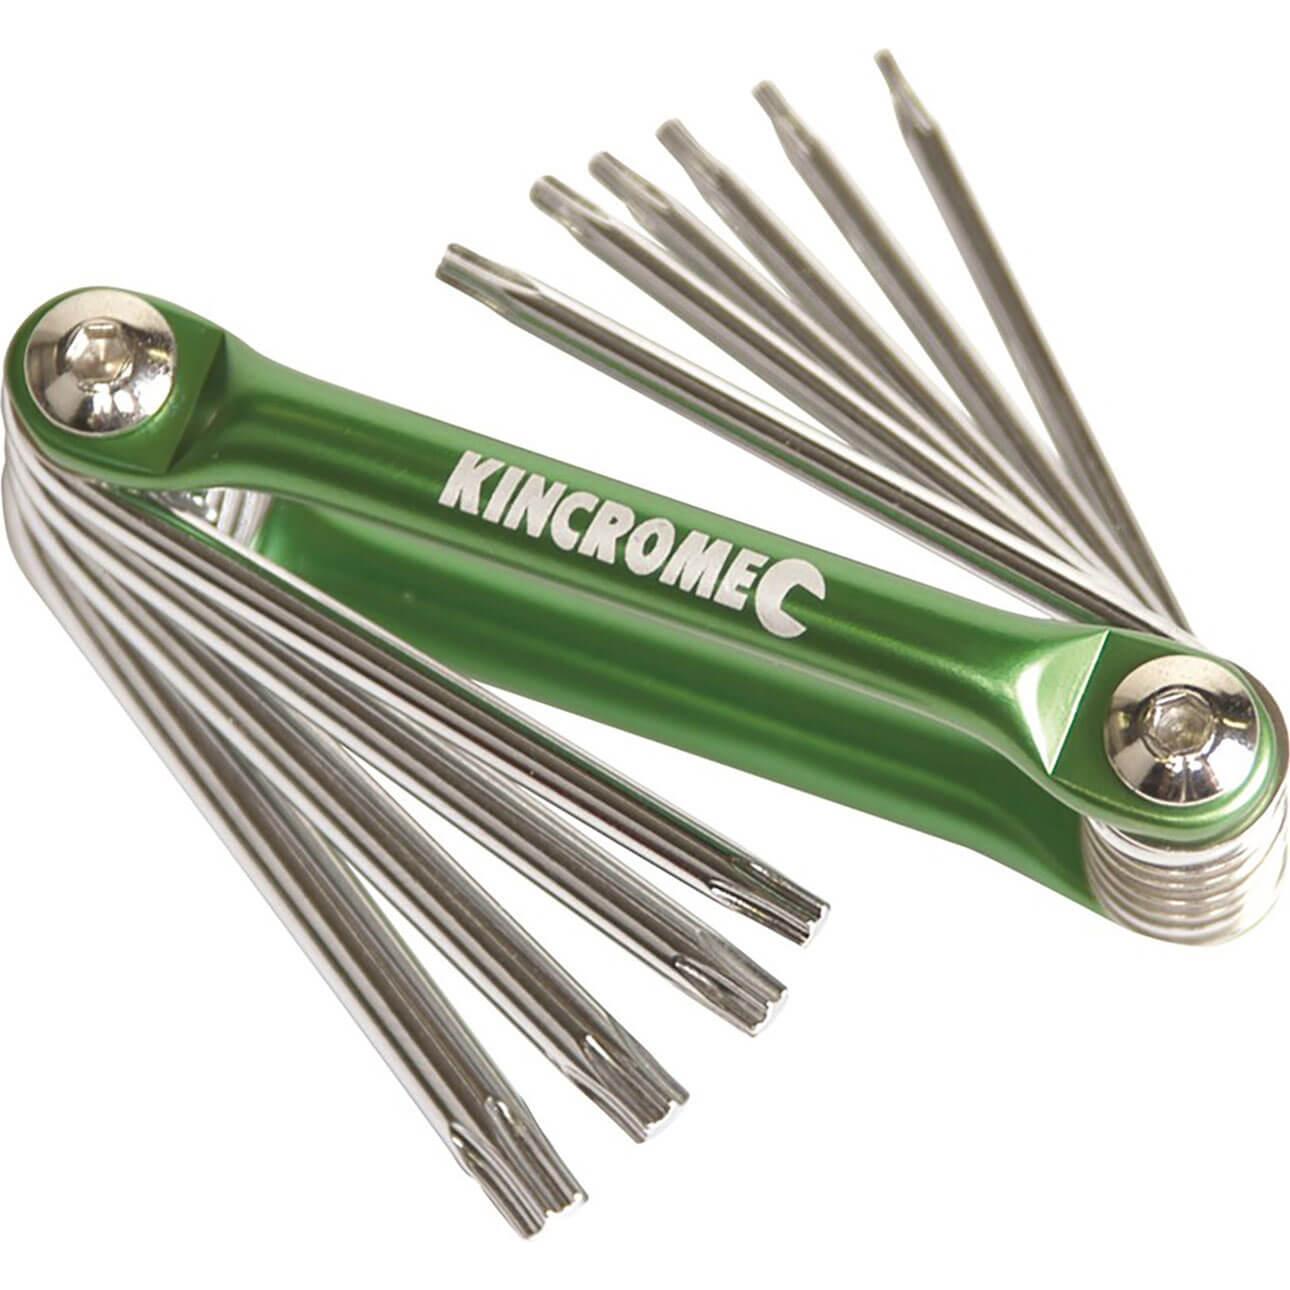 Image of Kincrome 10 Piece Torx Key Set